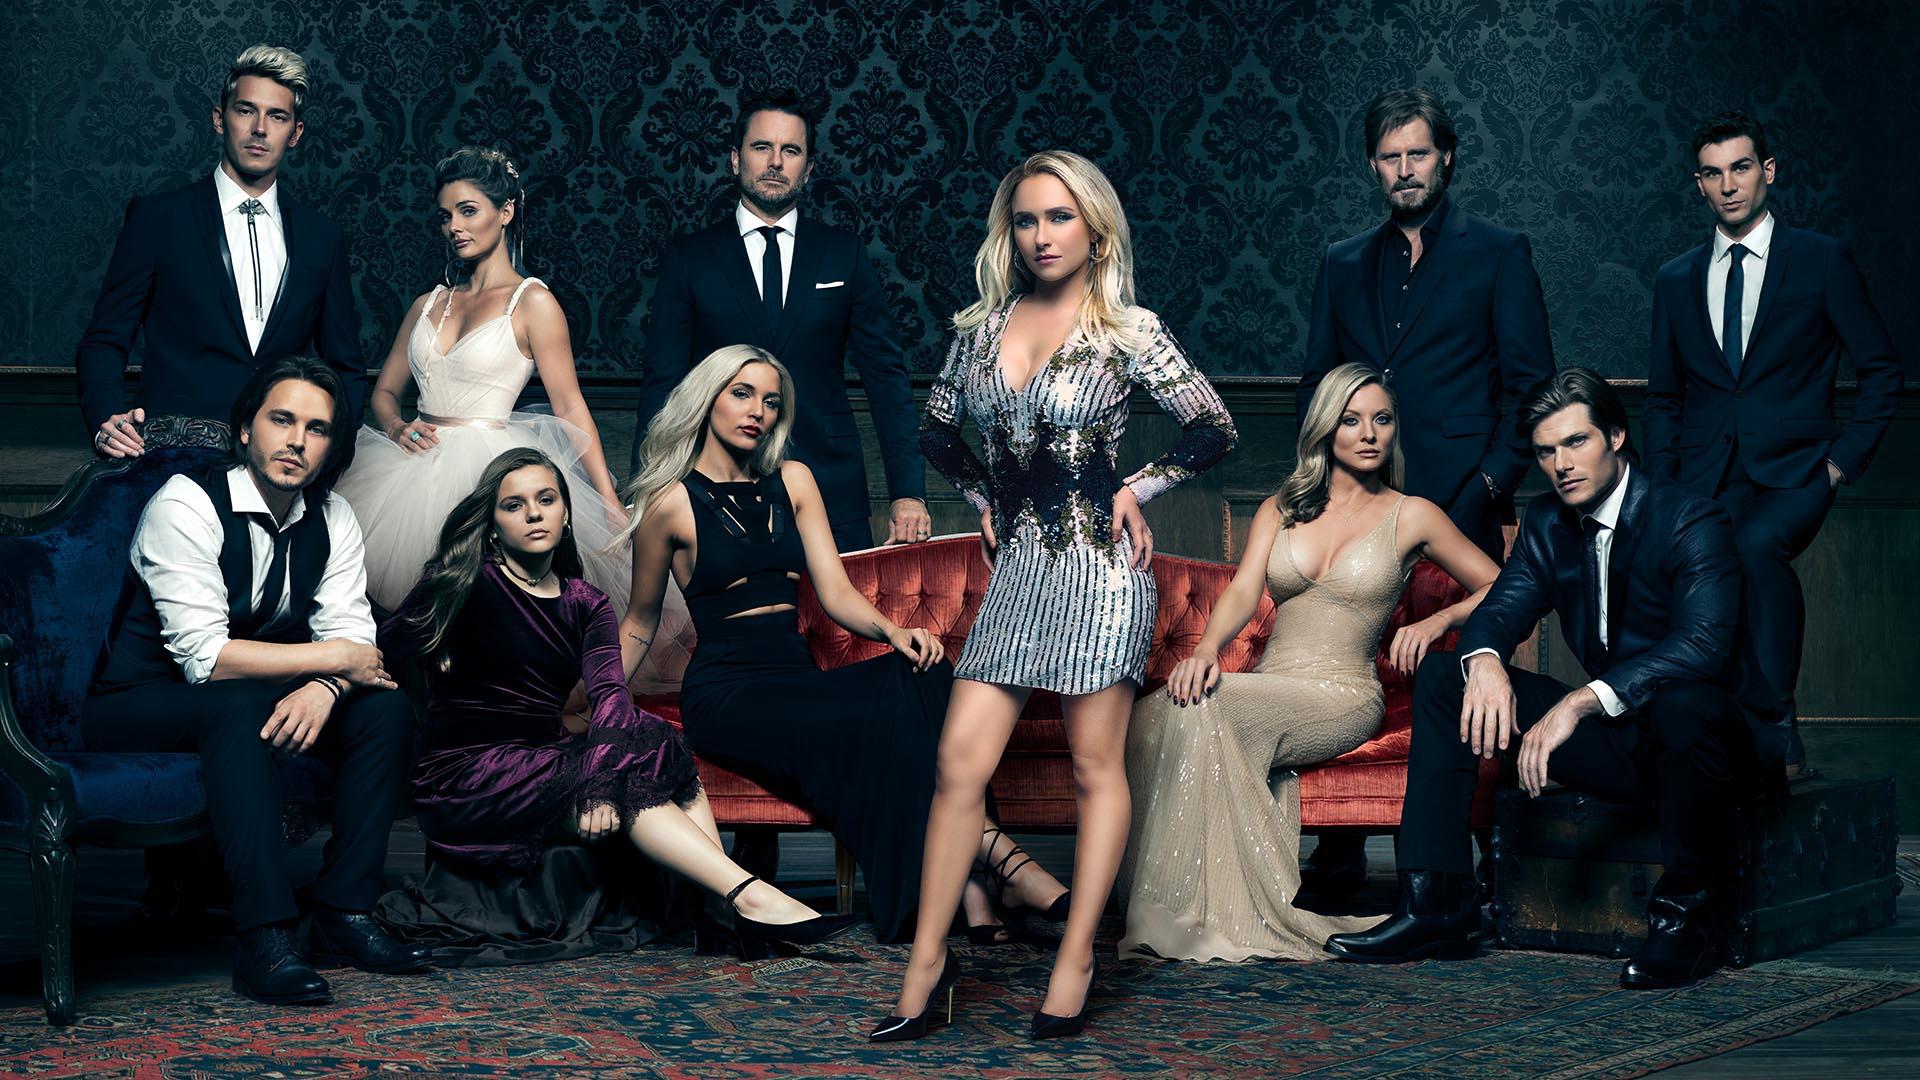 Nashville Serie Staffel 6